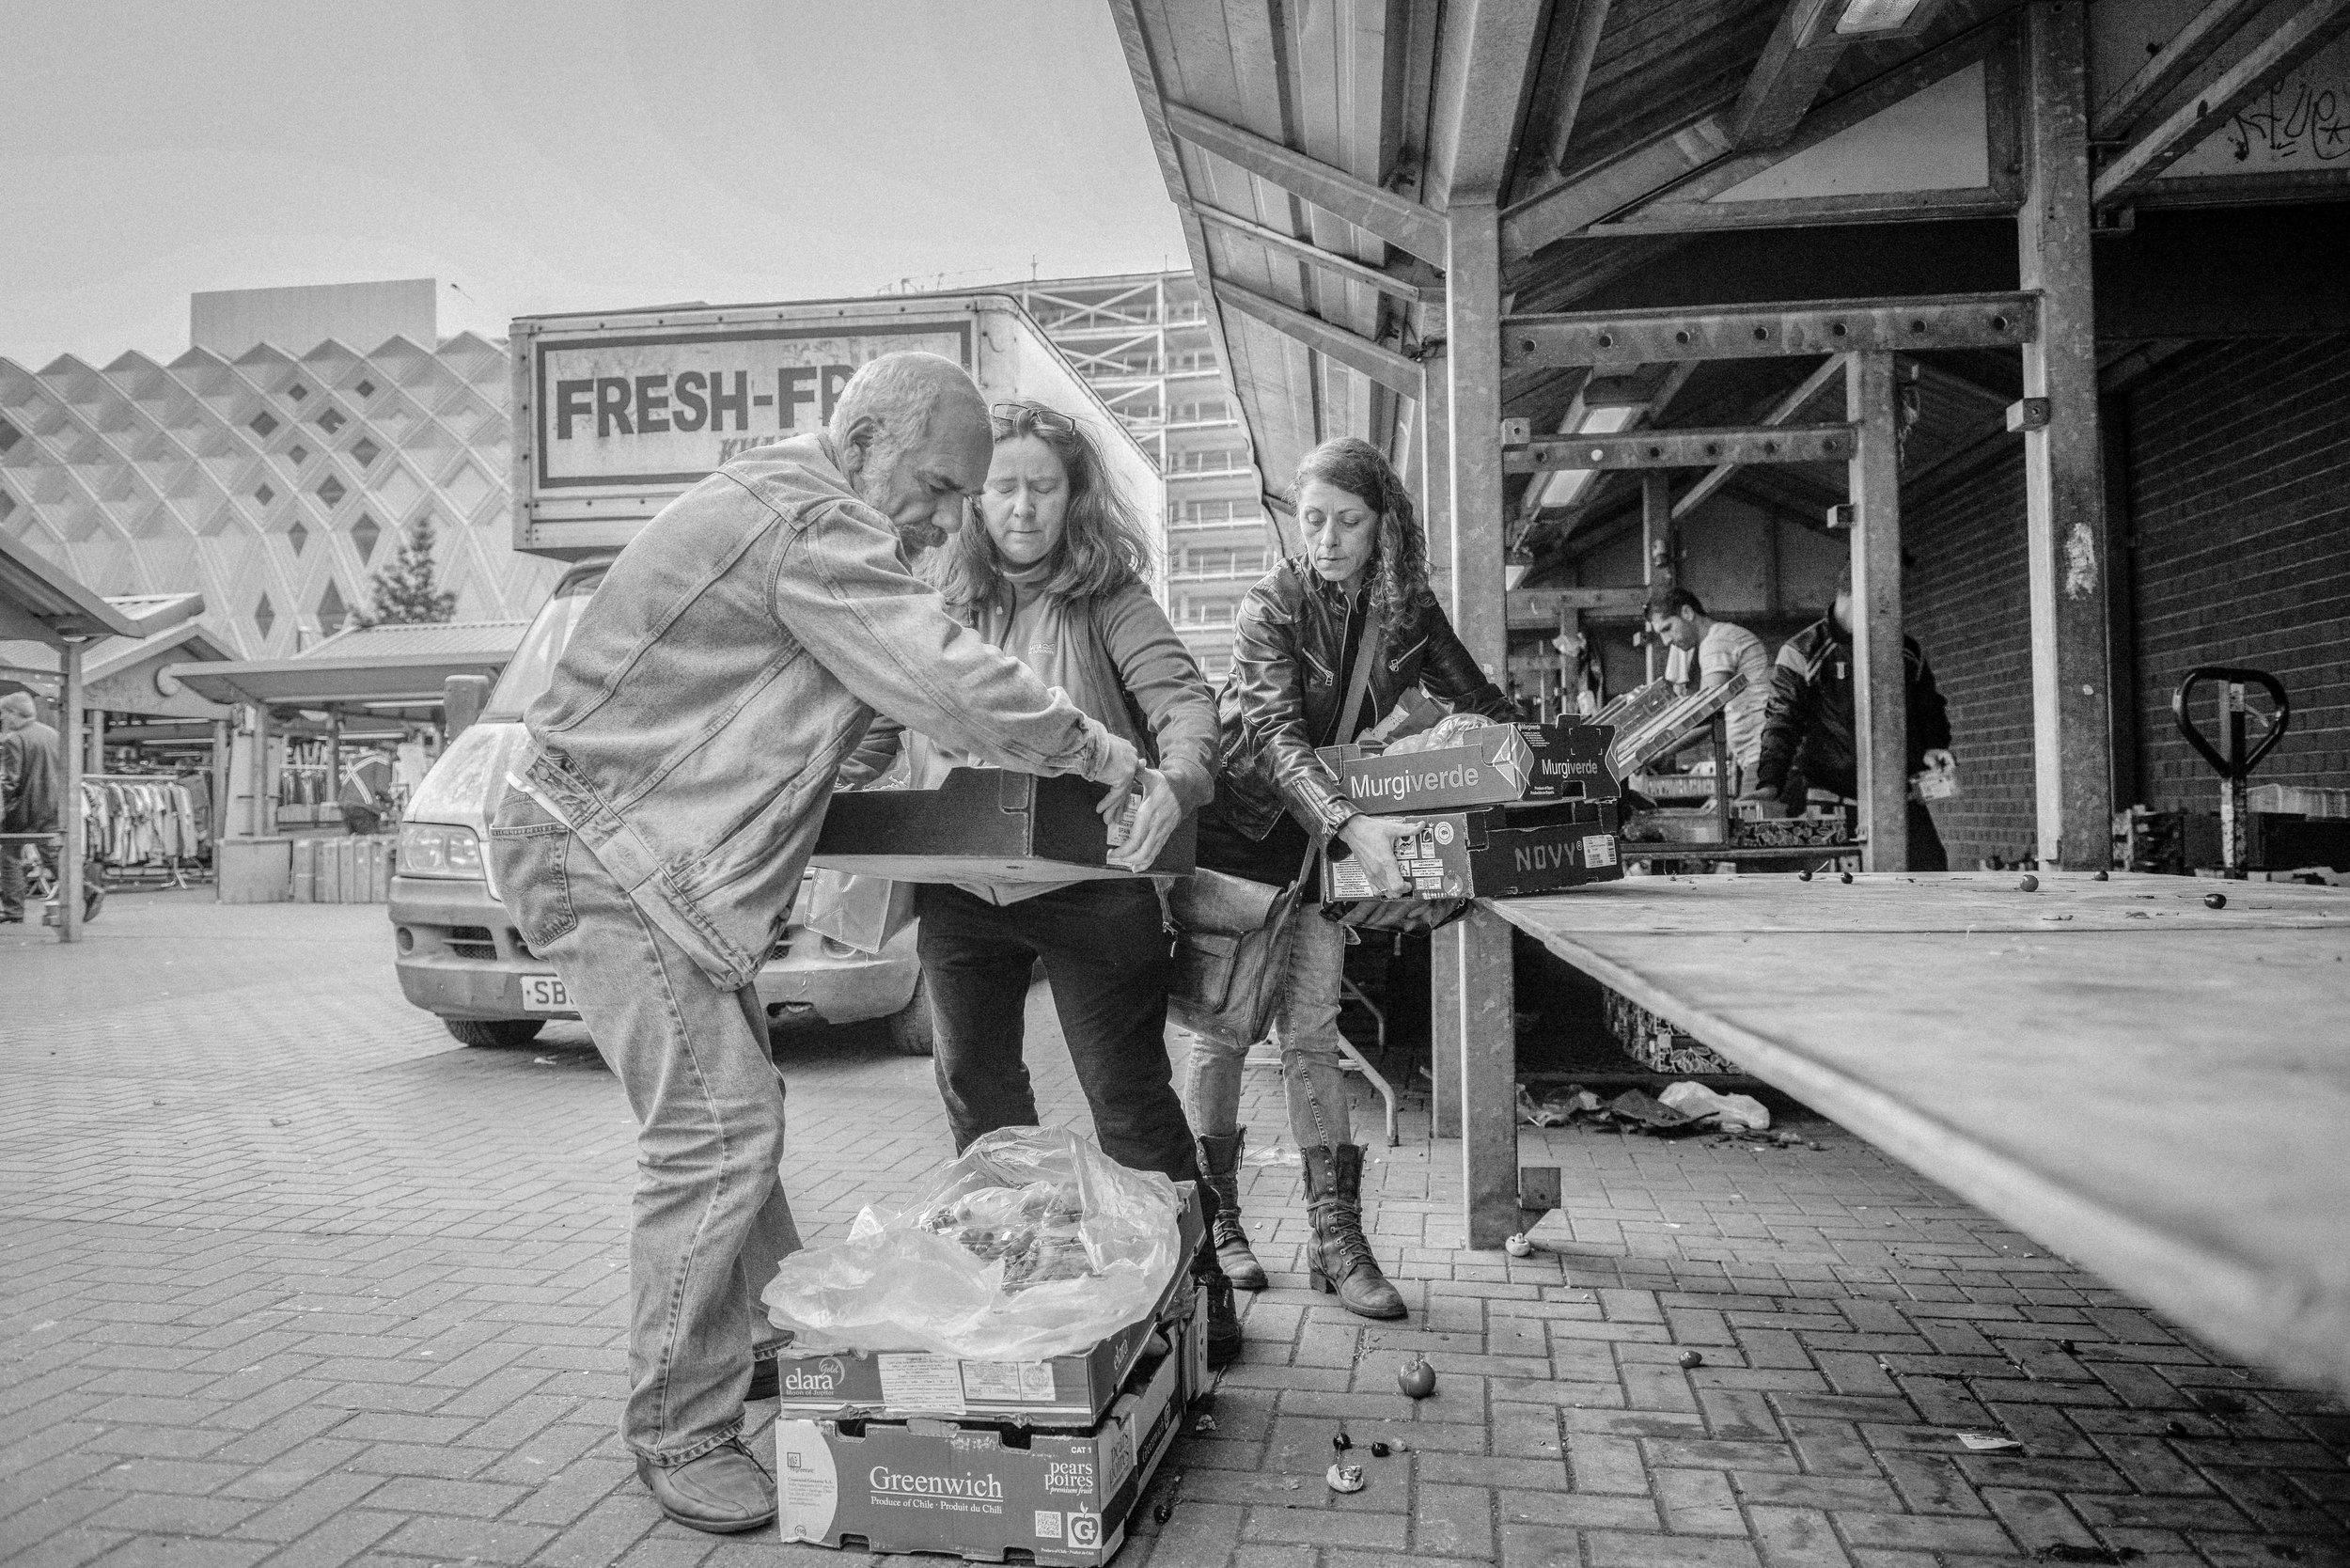 Leeds Market Interception 2